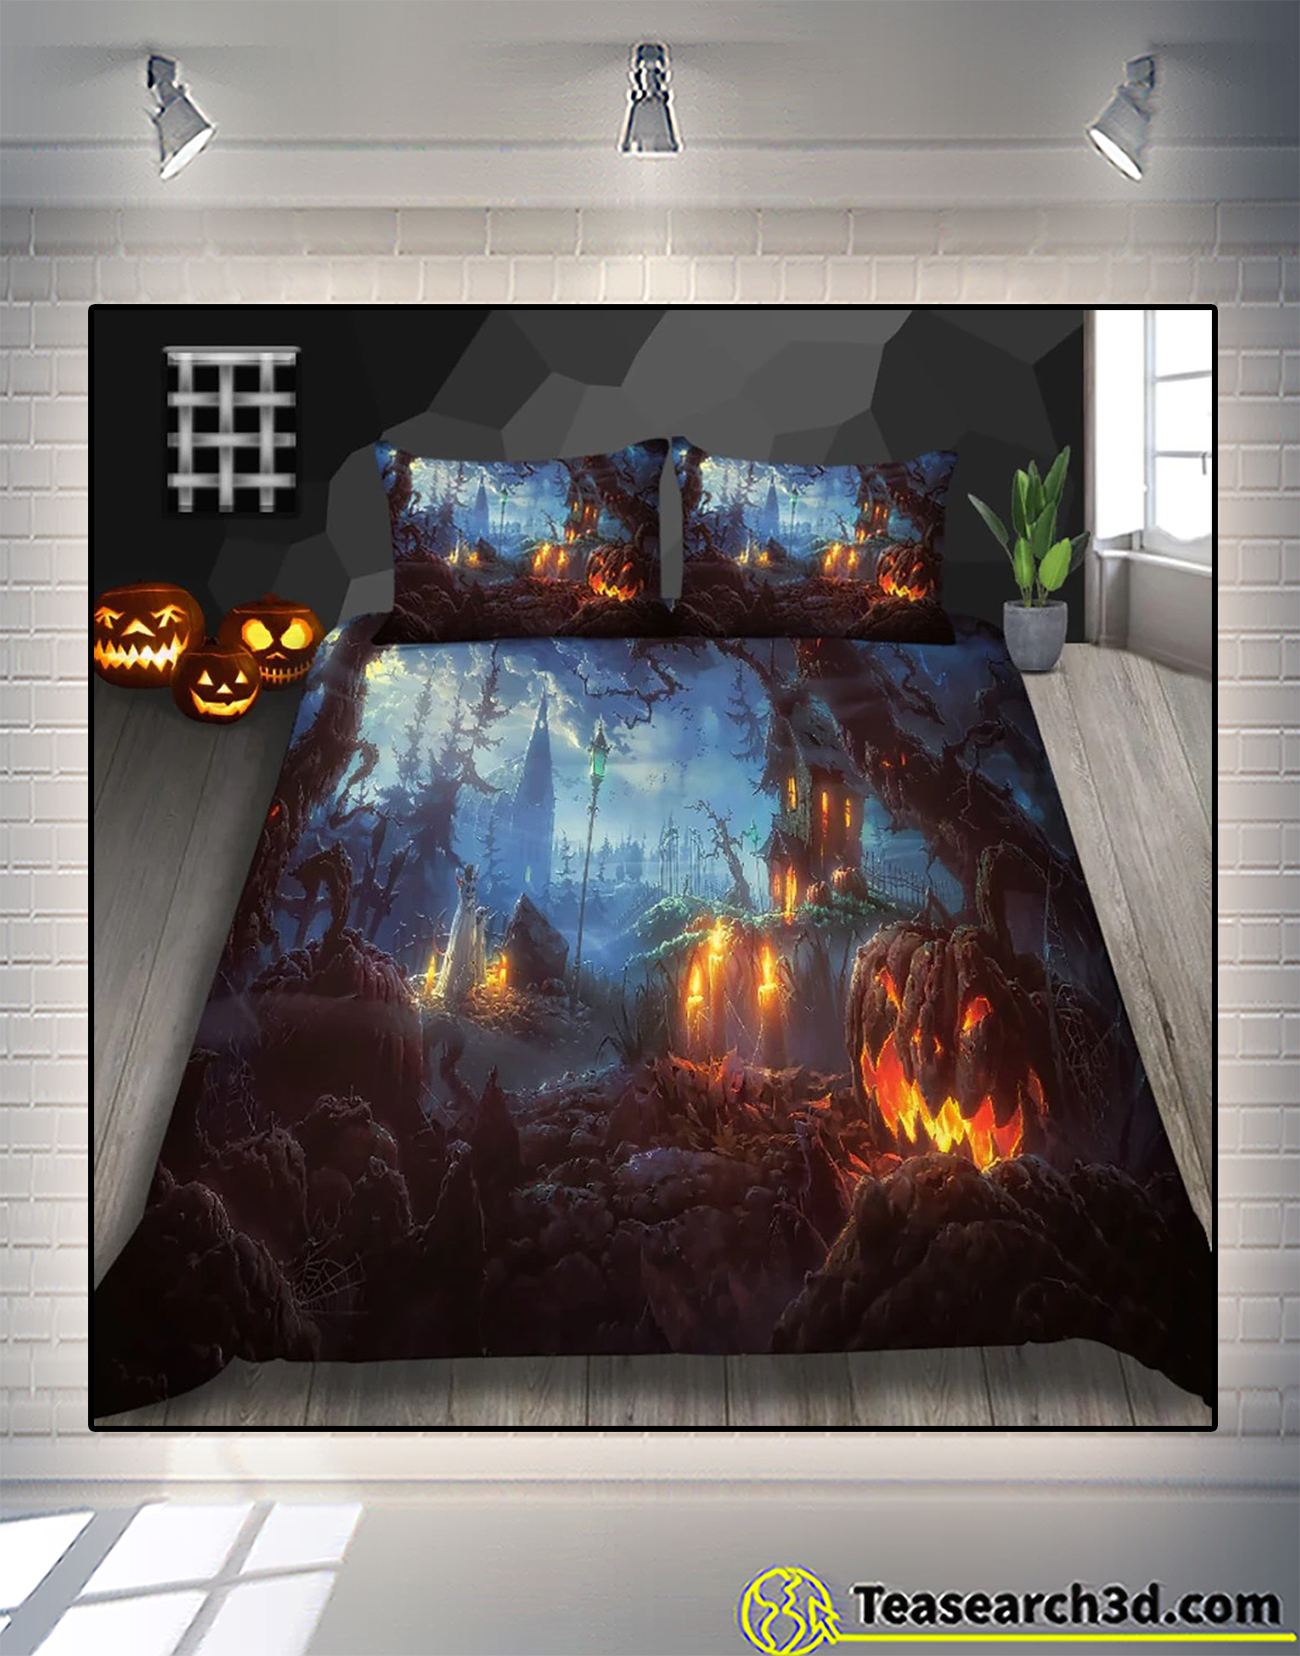 All hallows pasture halloween bedding set